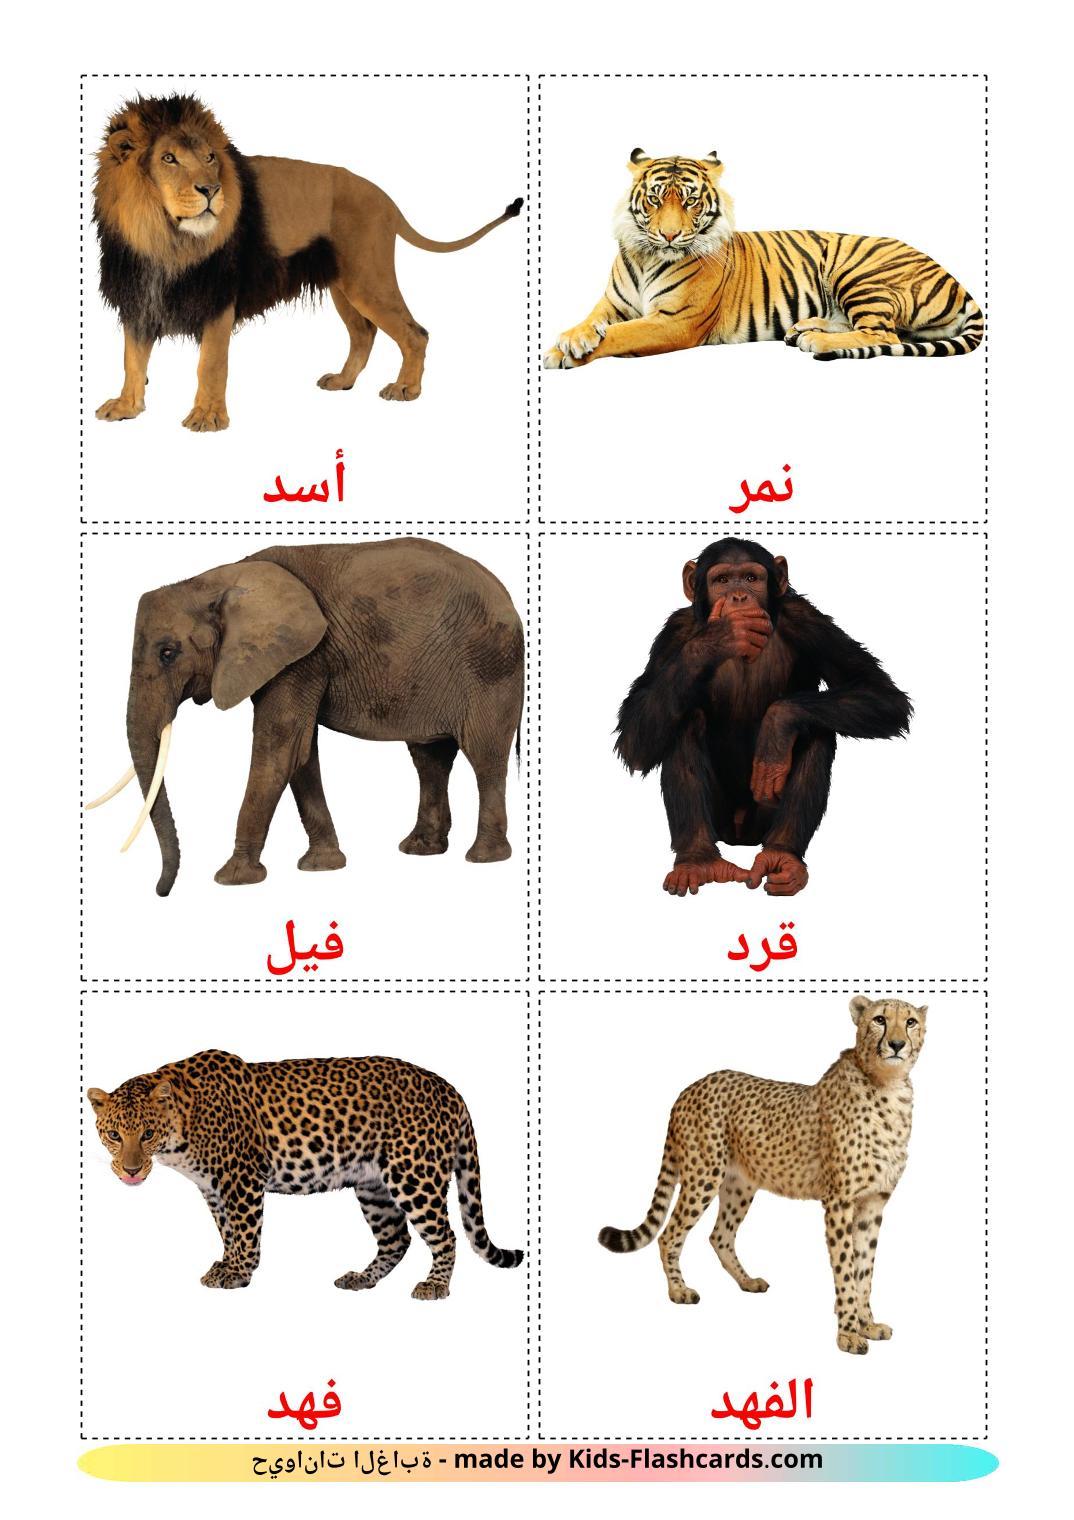 Jungle animals - 21 Free Printable arabic Flashcards